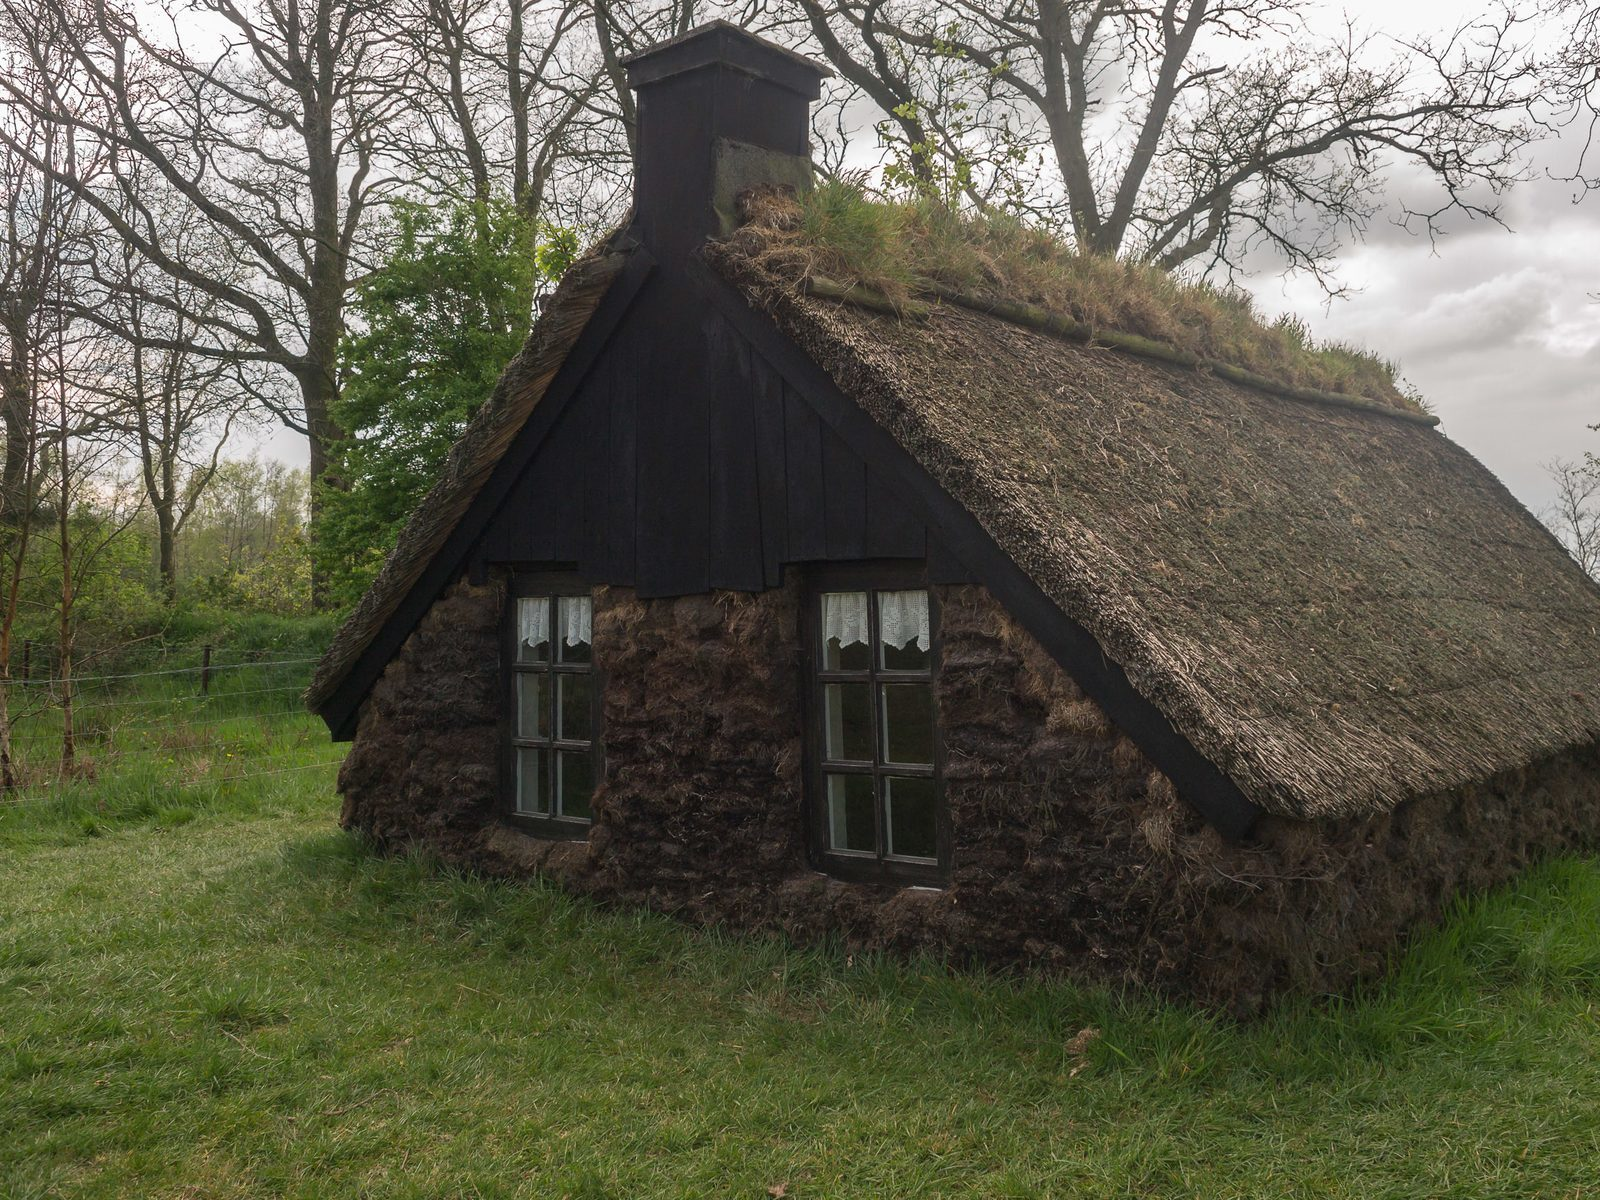 Openluchtmuseum Themapark De Spitkeet – Harkema